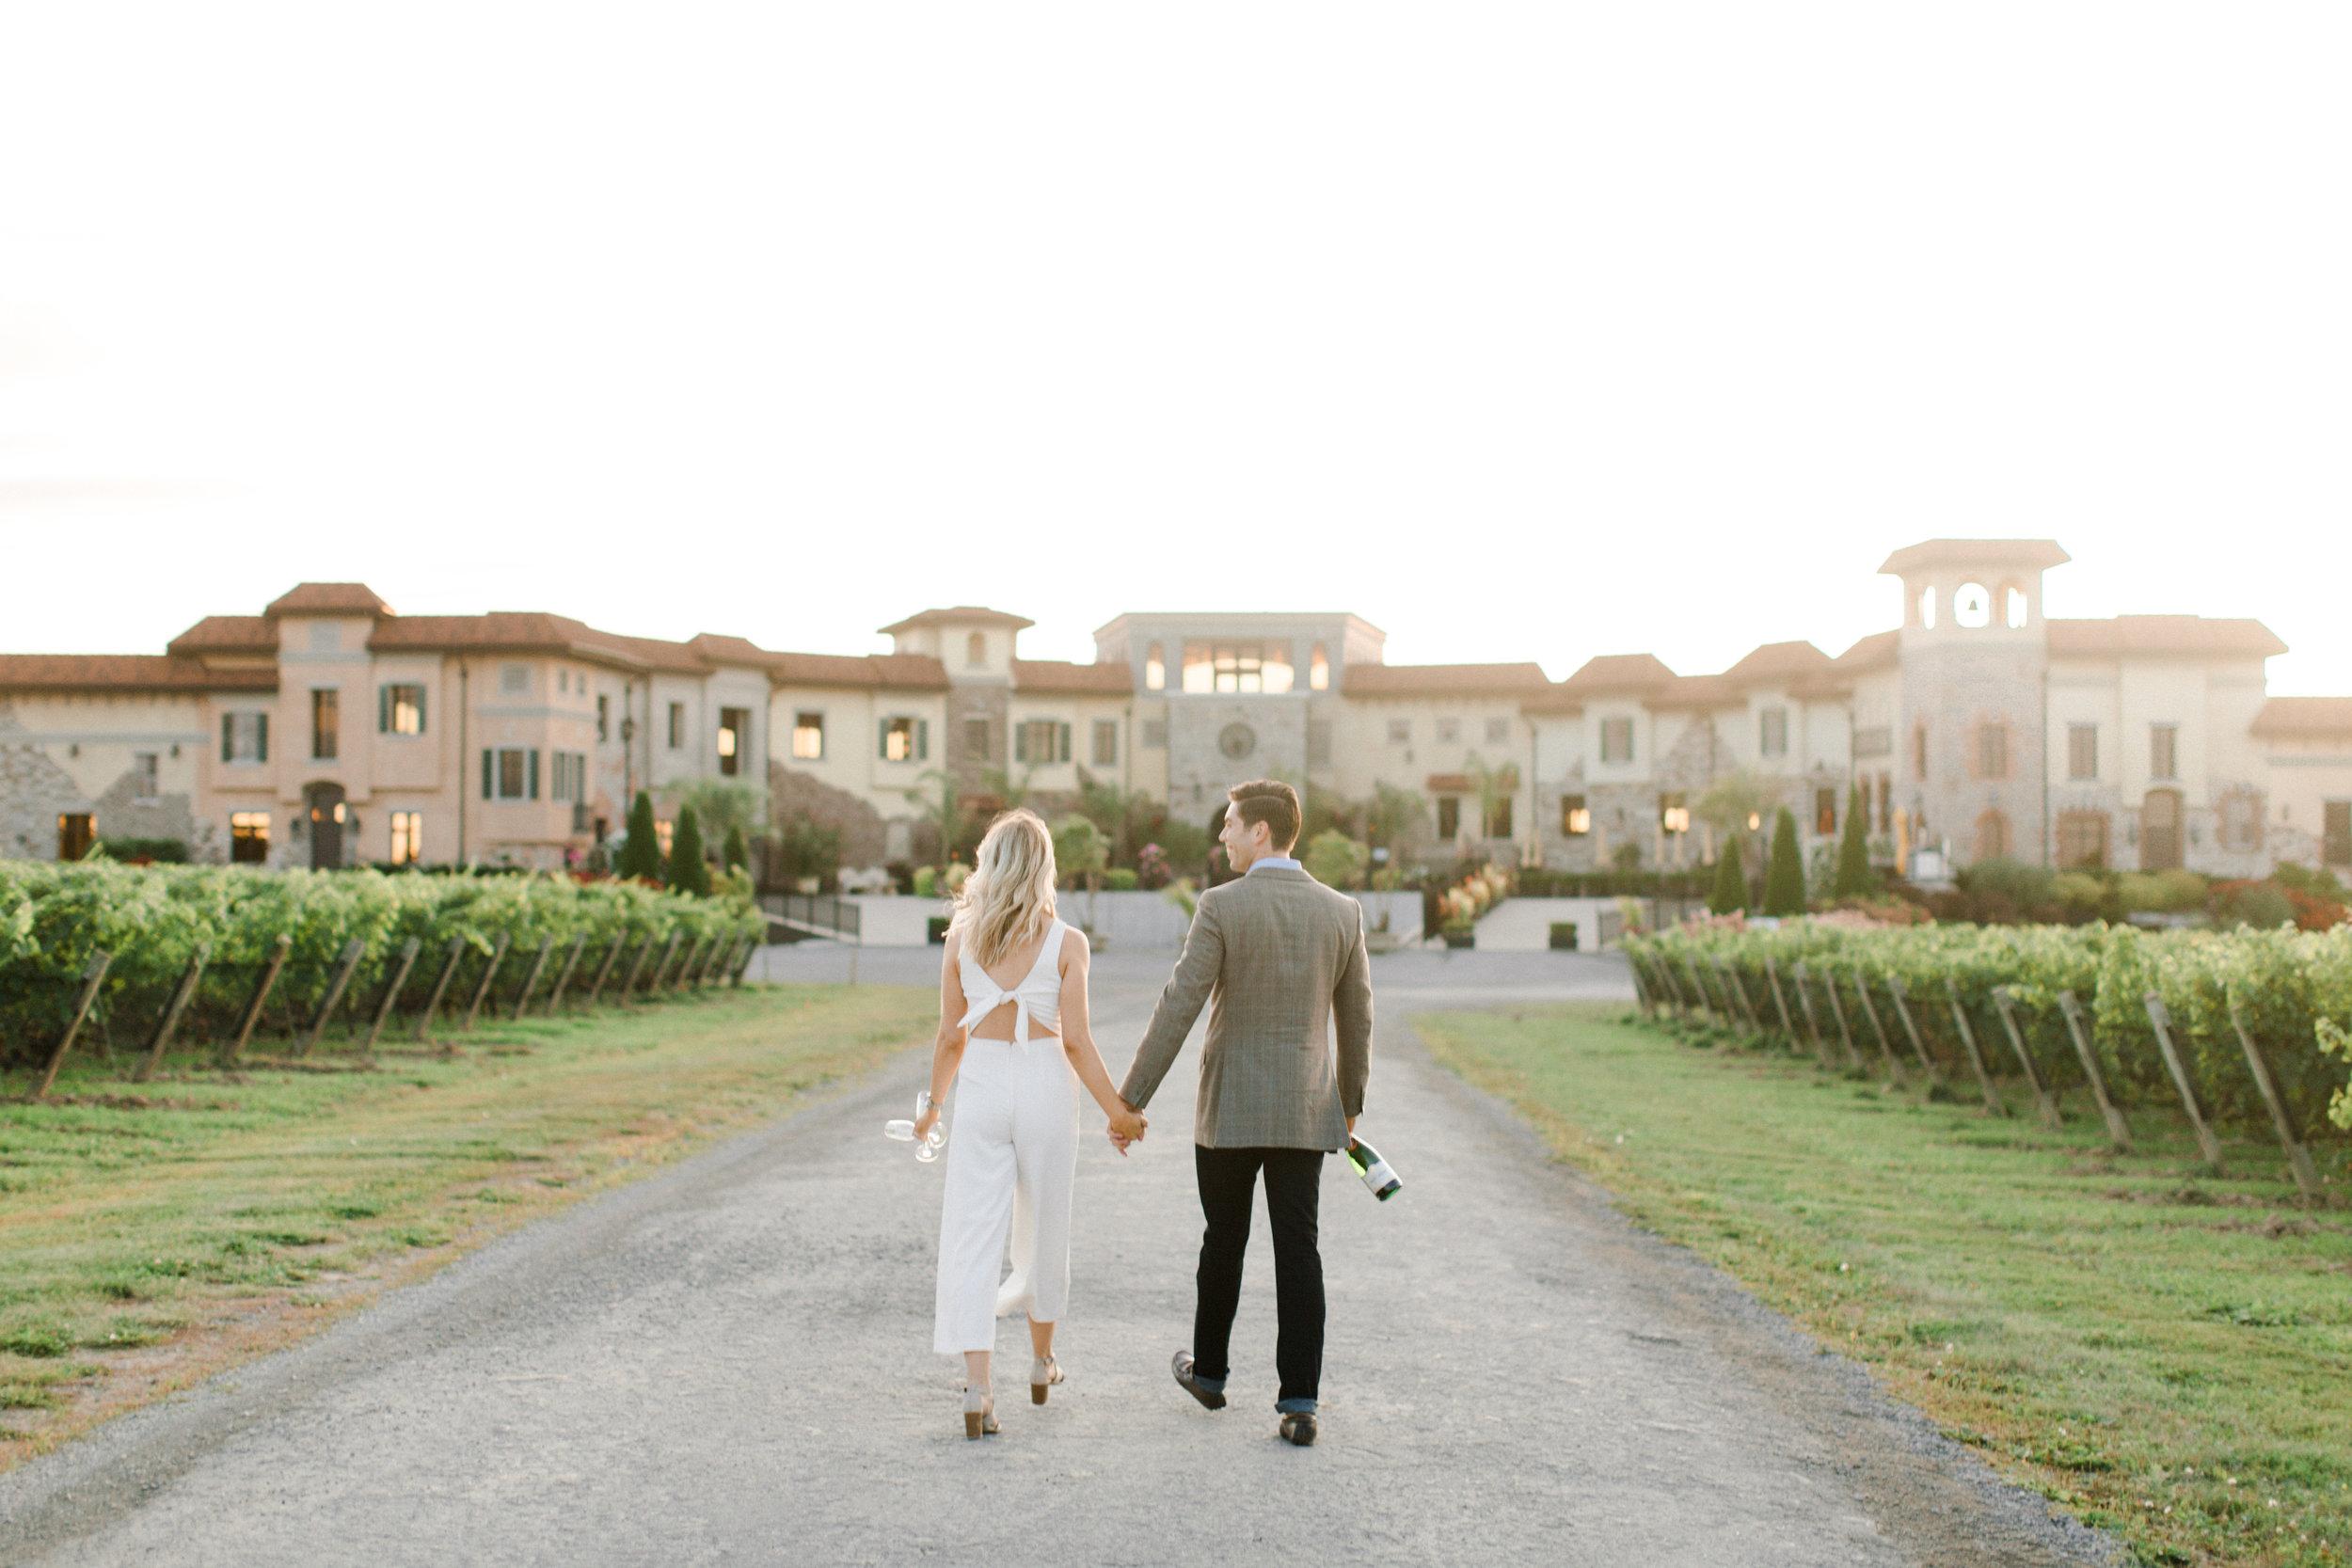 kurtz-orchard-gracewood-winery-wedding-photographer-richelle-hunter-sarah-jonathan-90.jpg